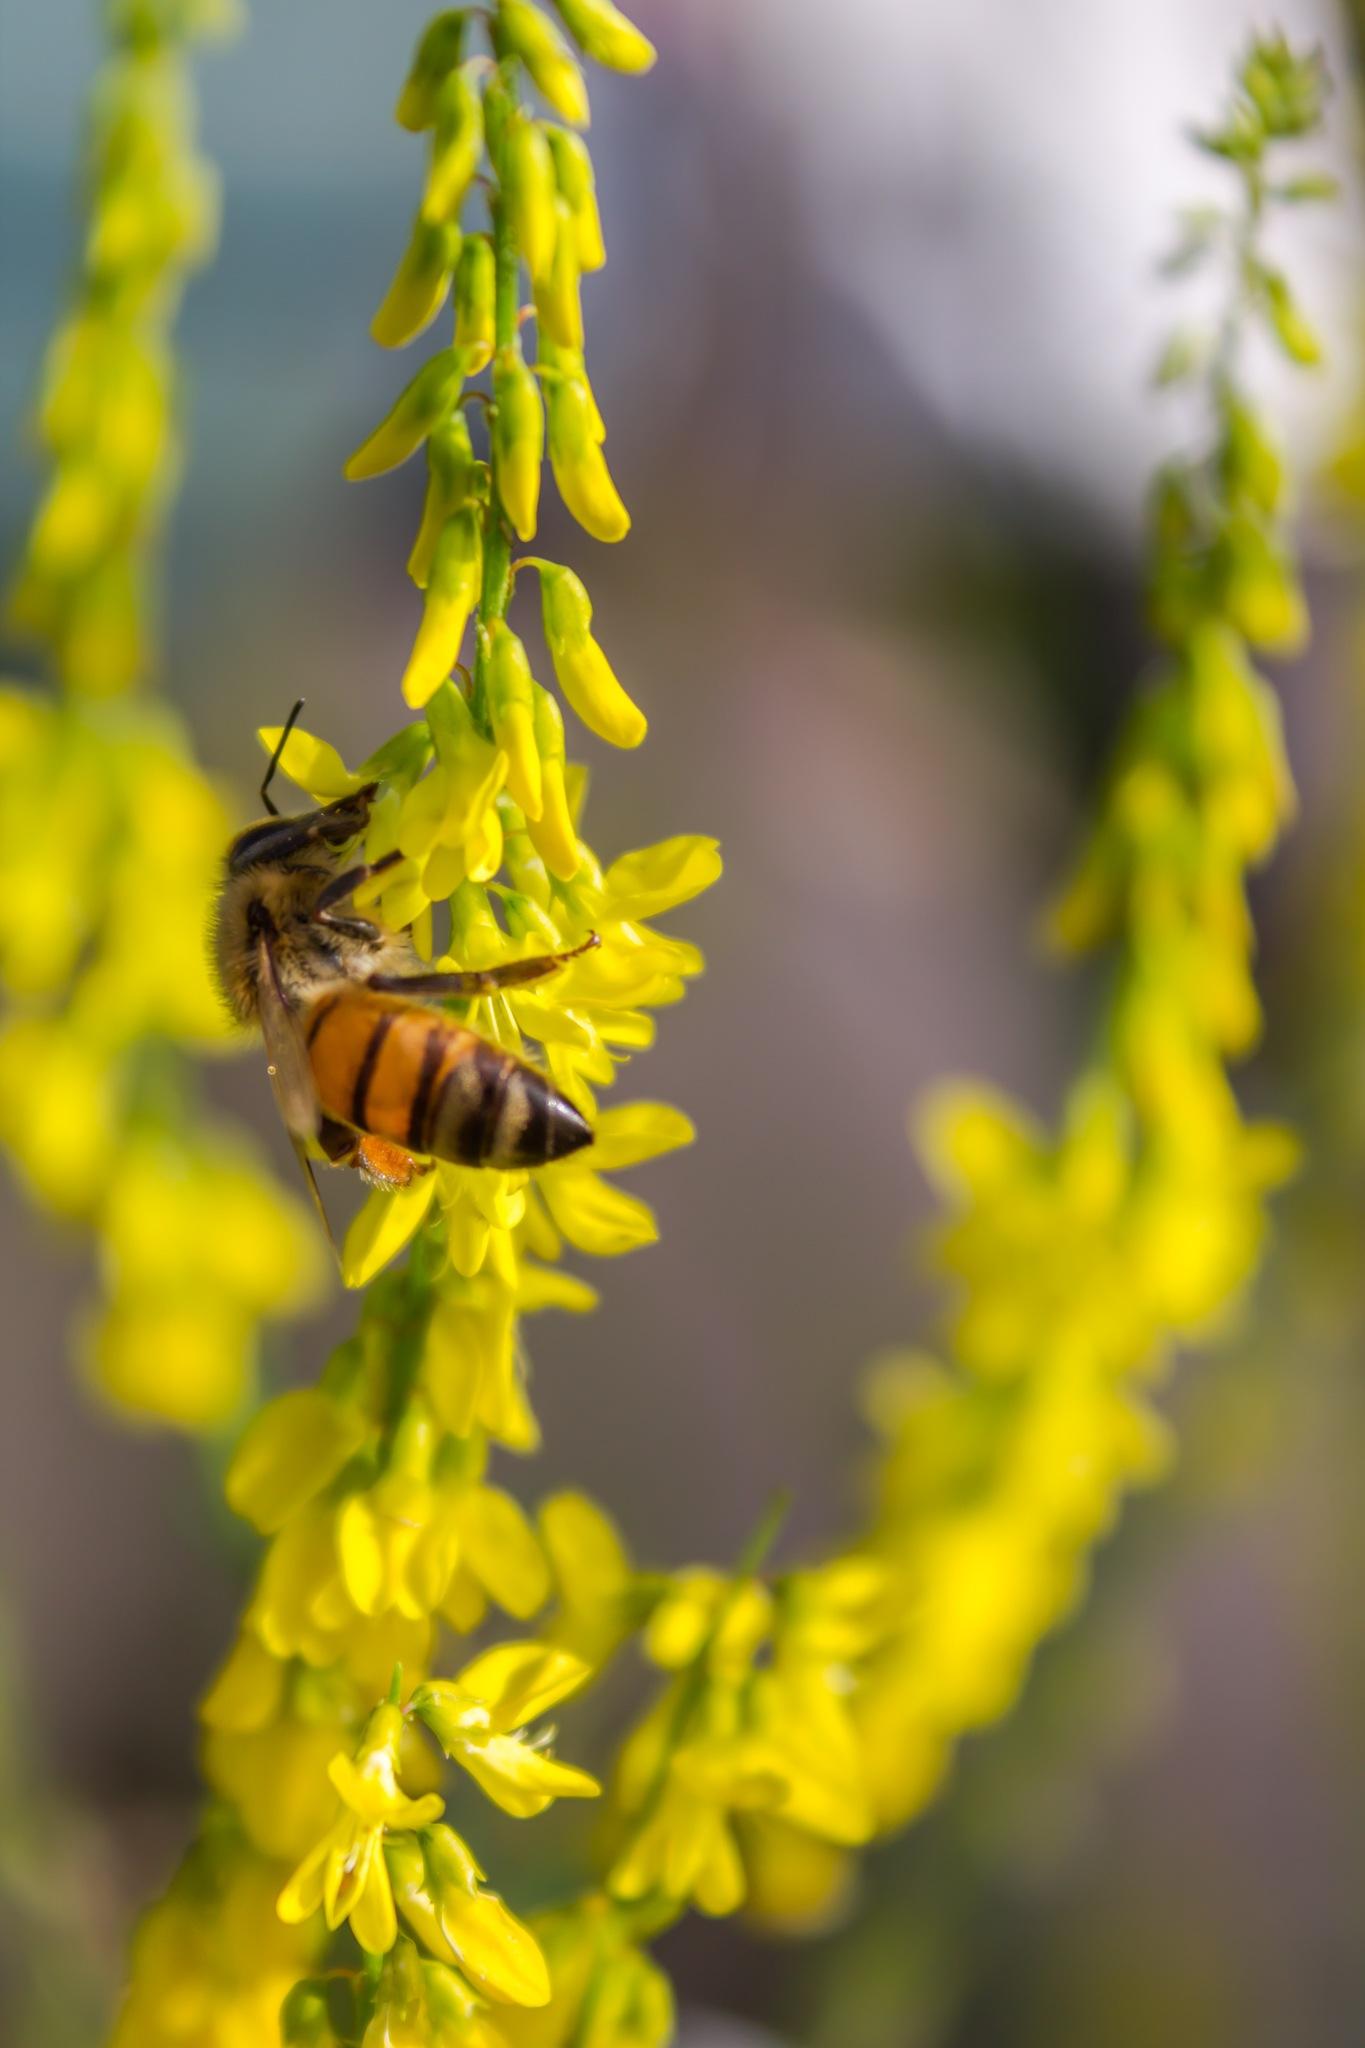 Busy Bee by Behzad Shabani